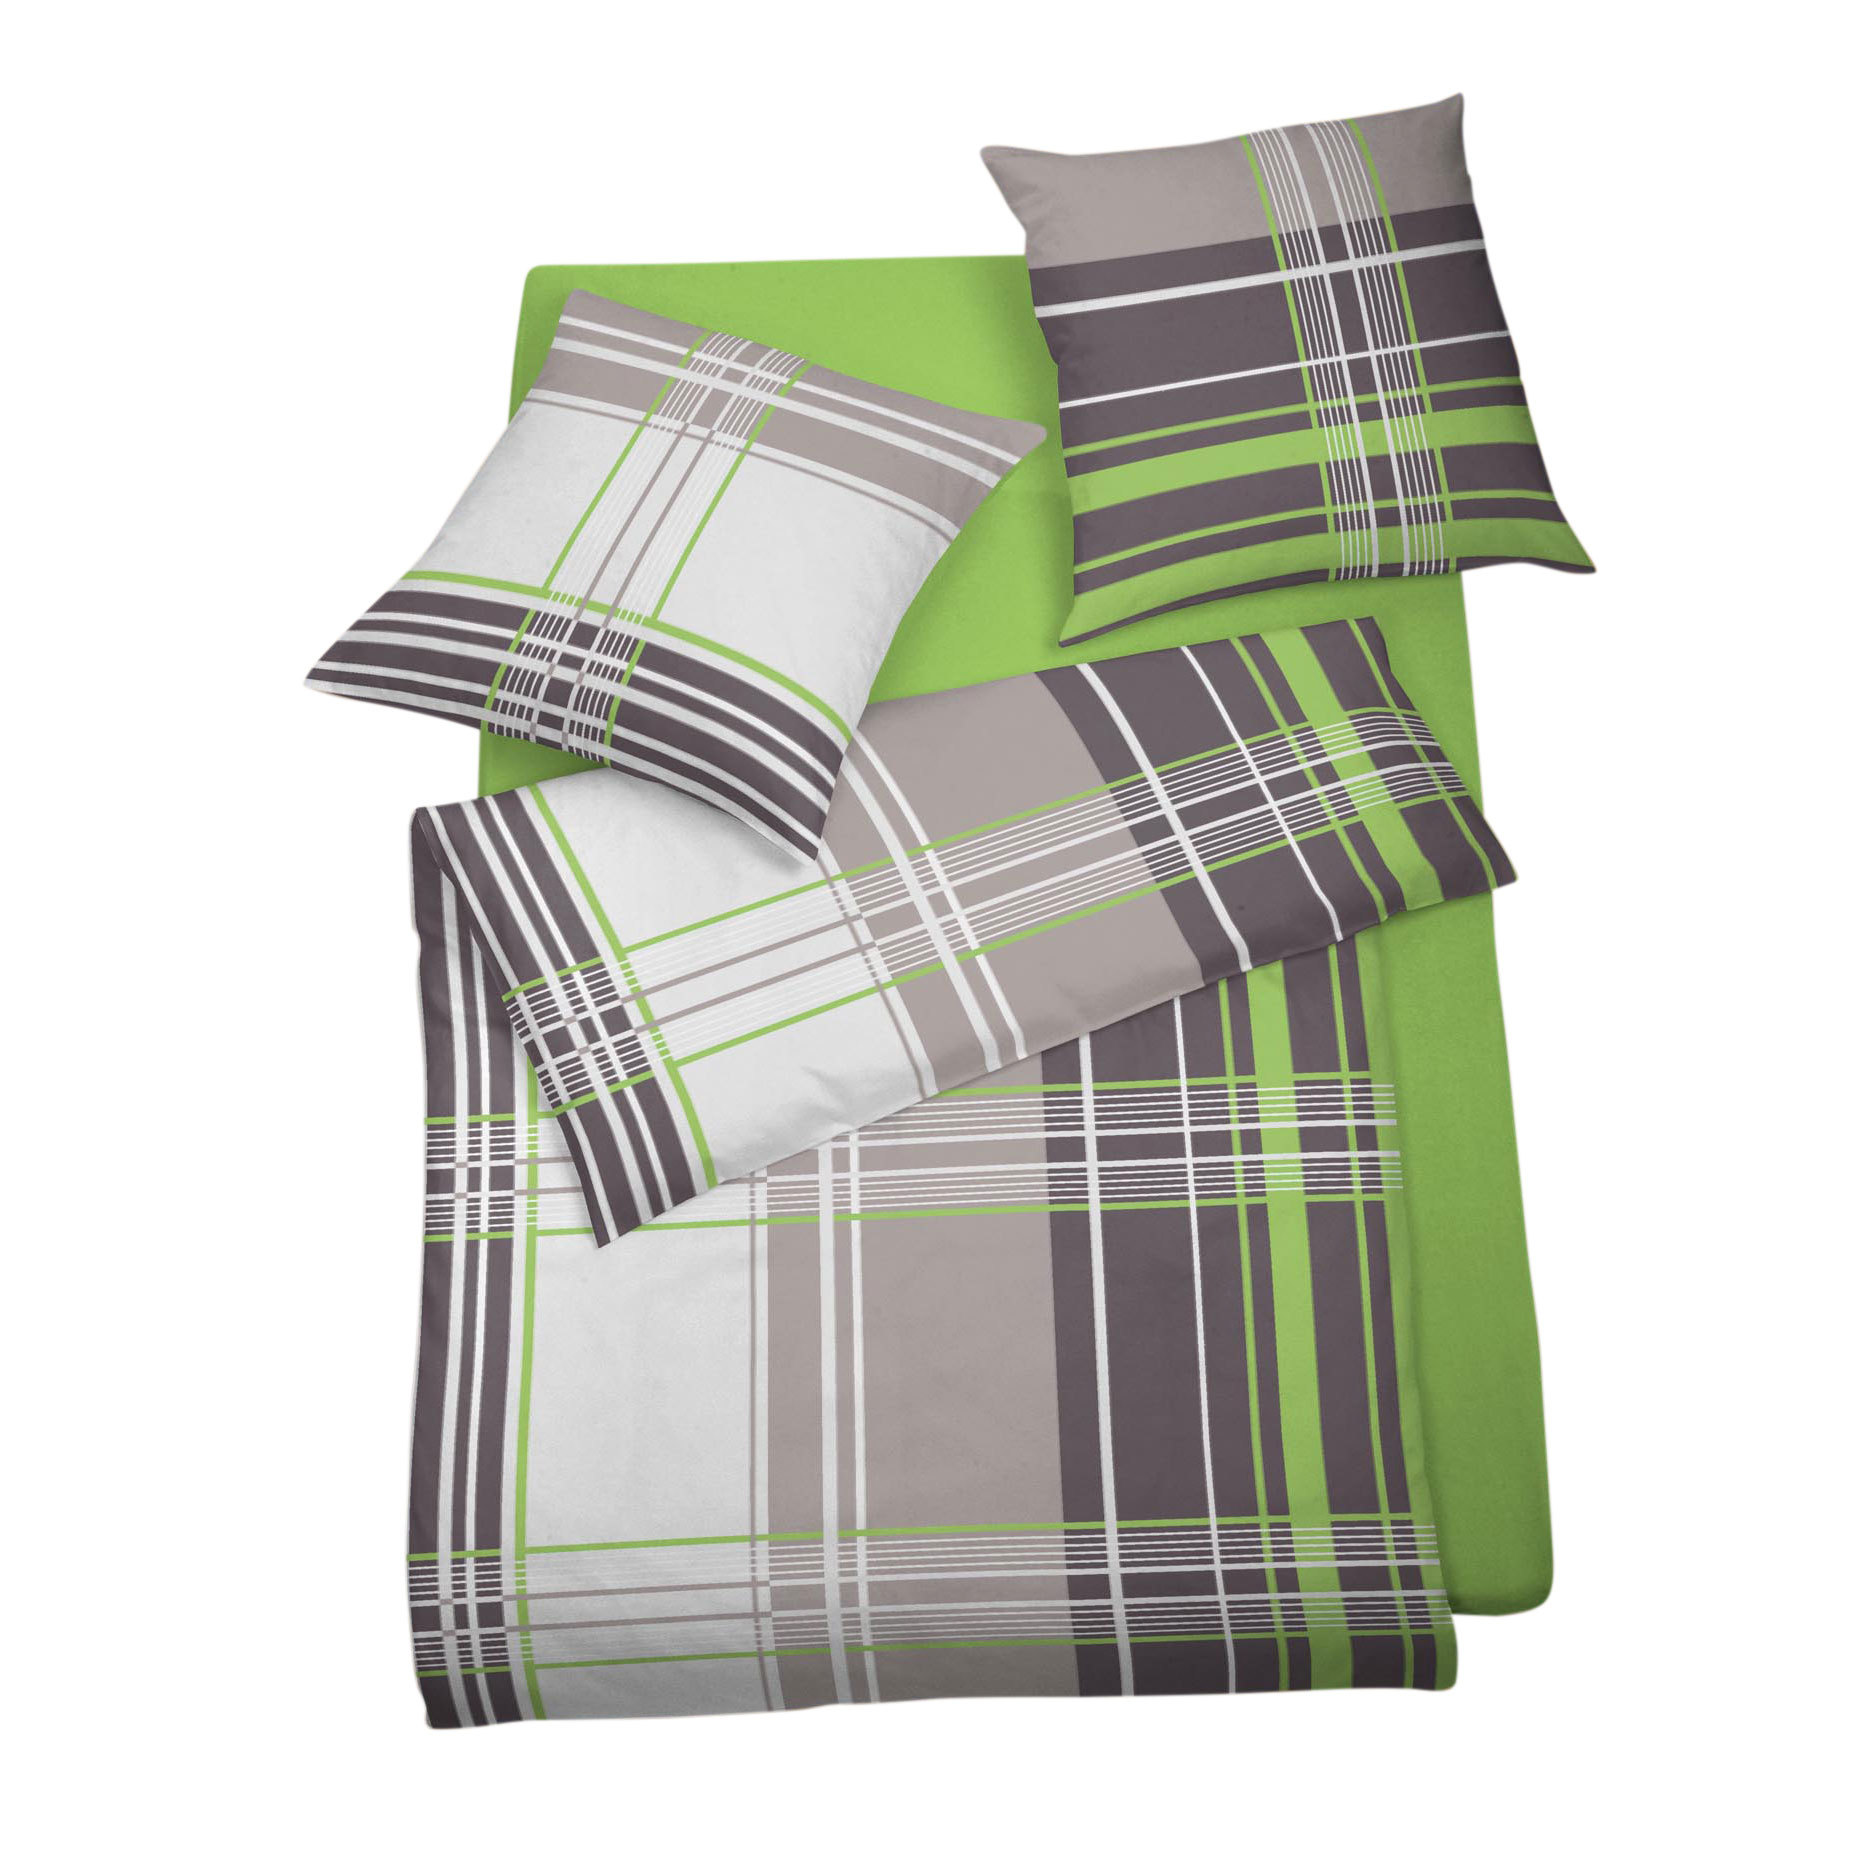 bettwarenshop feinbiber bettw sche streifen apfel g nstig online kaufen bei bettwaren shop. Black Bedroom Furniture Sets. Home Design Ideas